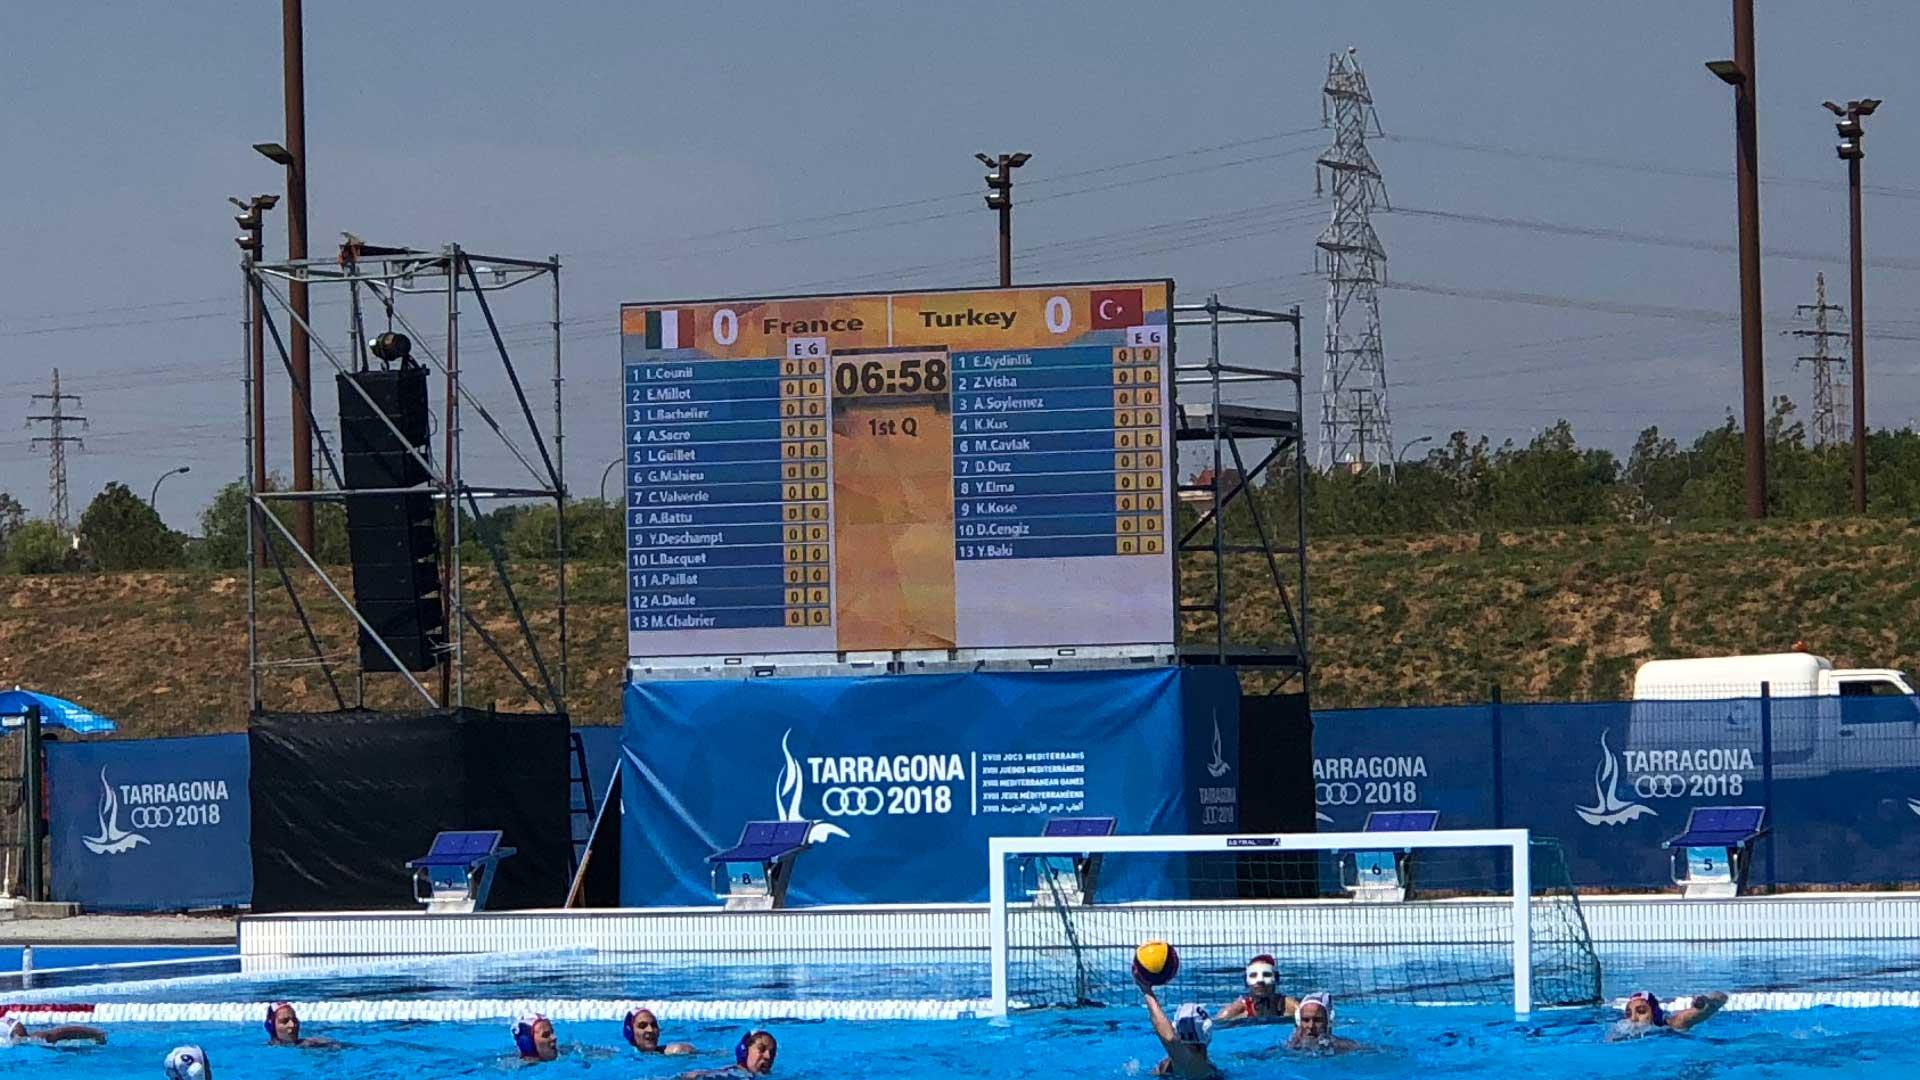 XVIII Mediterranean Games